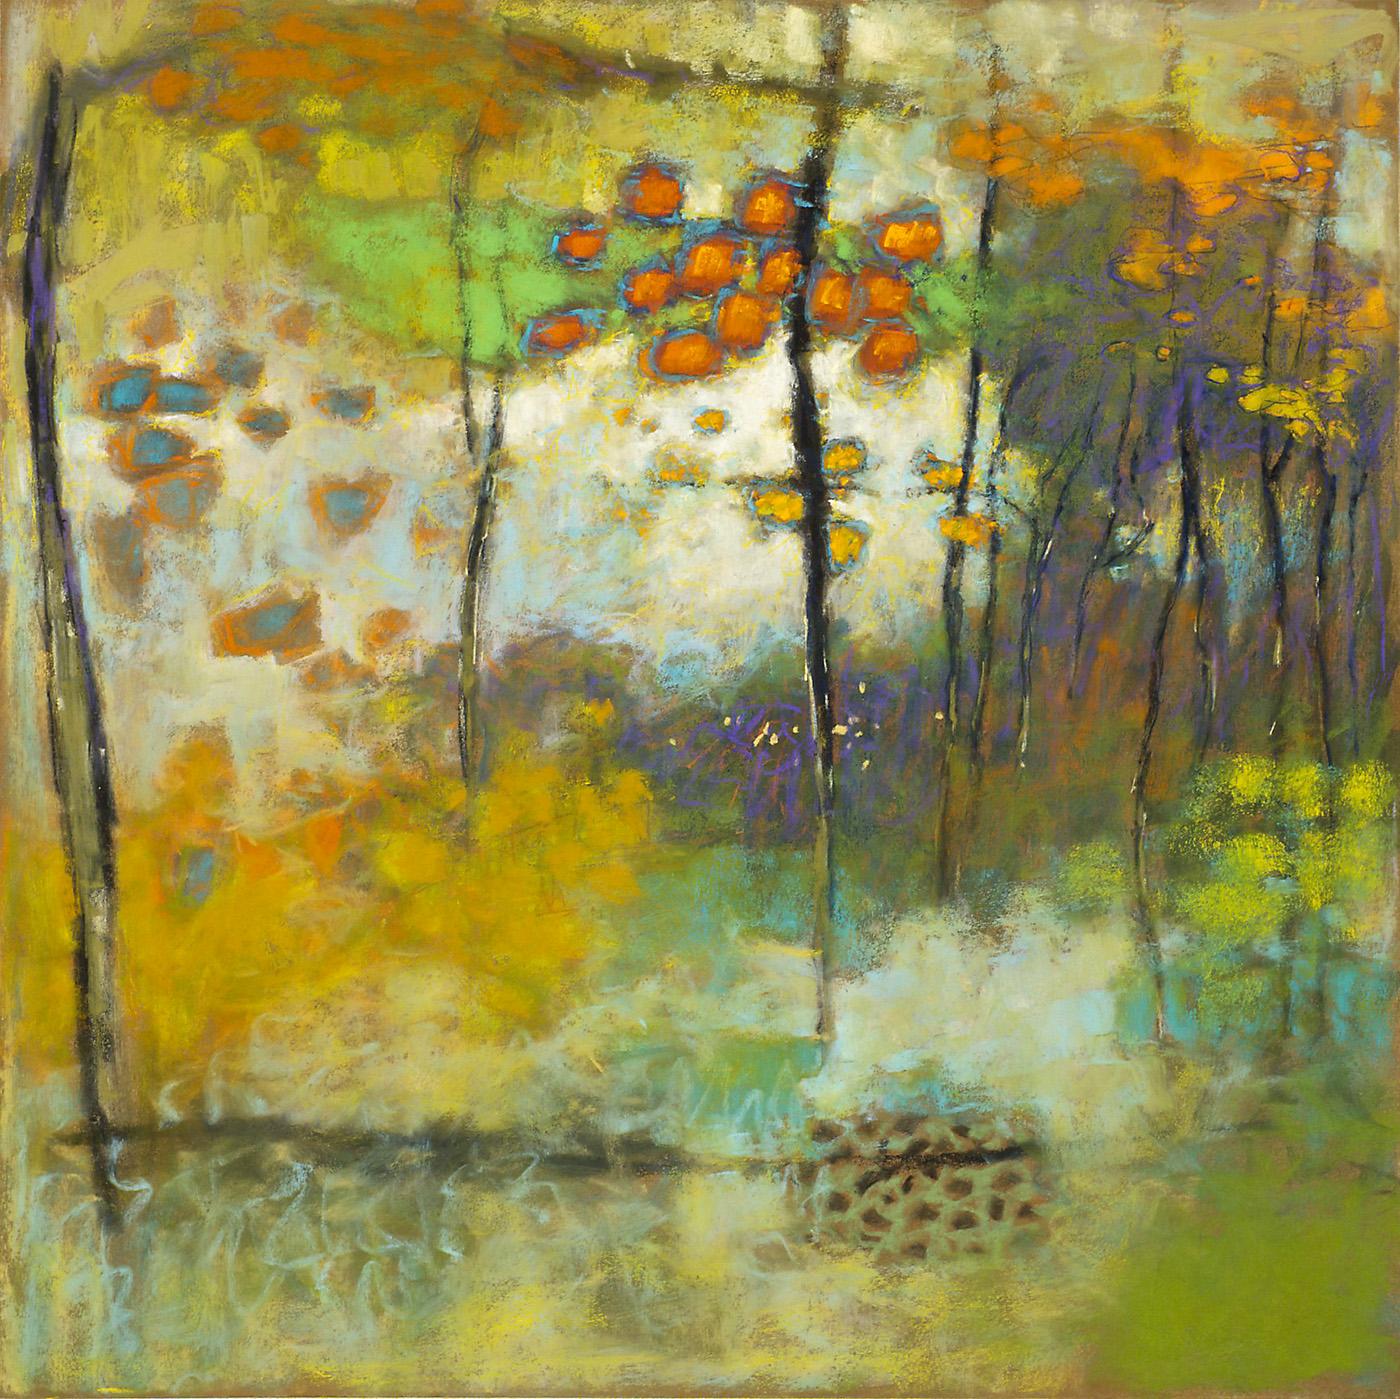 "Lingering Impressions   | pastel on paper | 24 x 24"" | 2013"